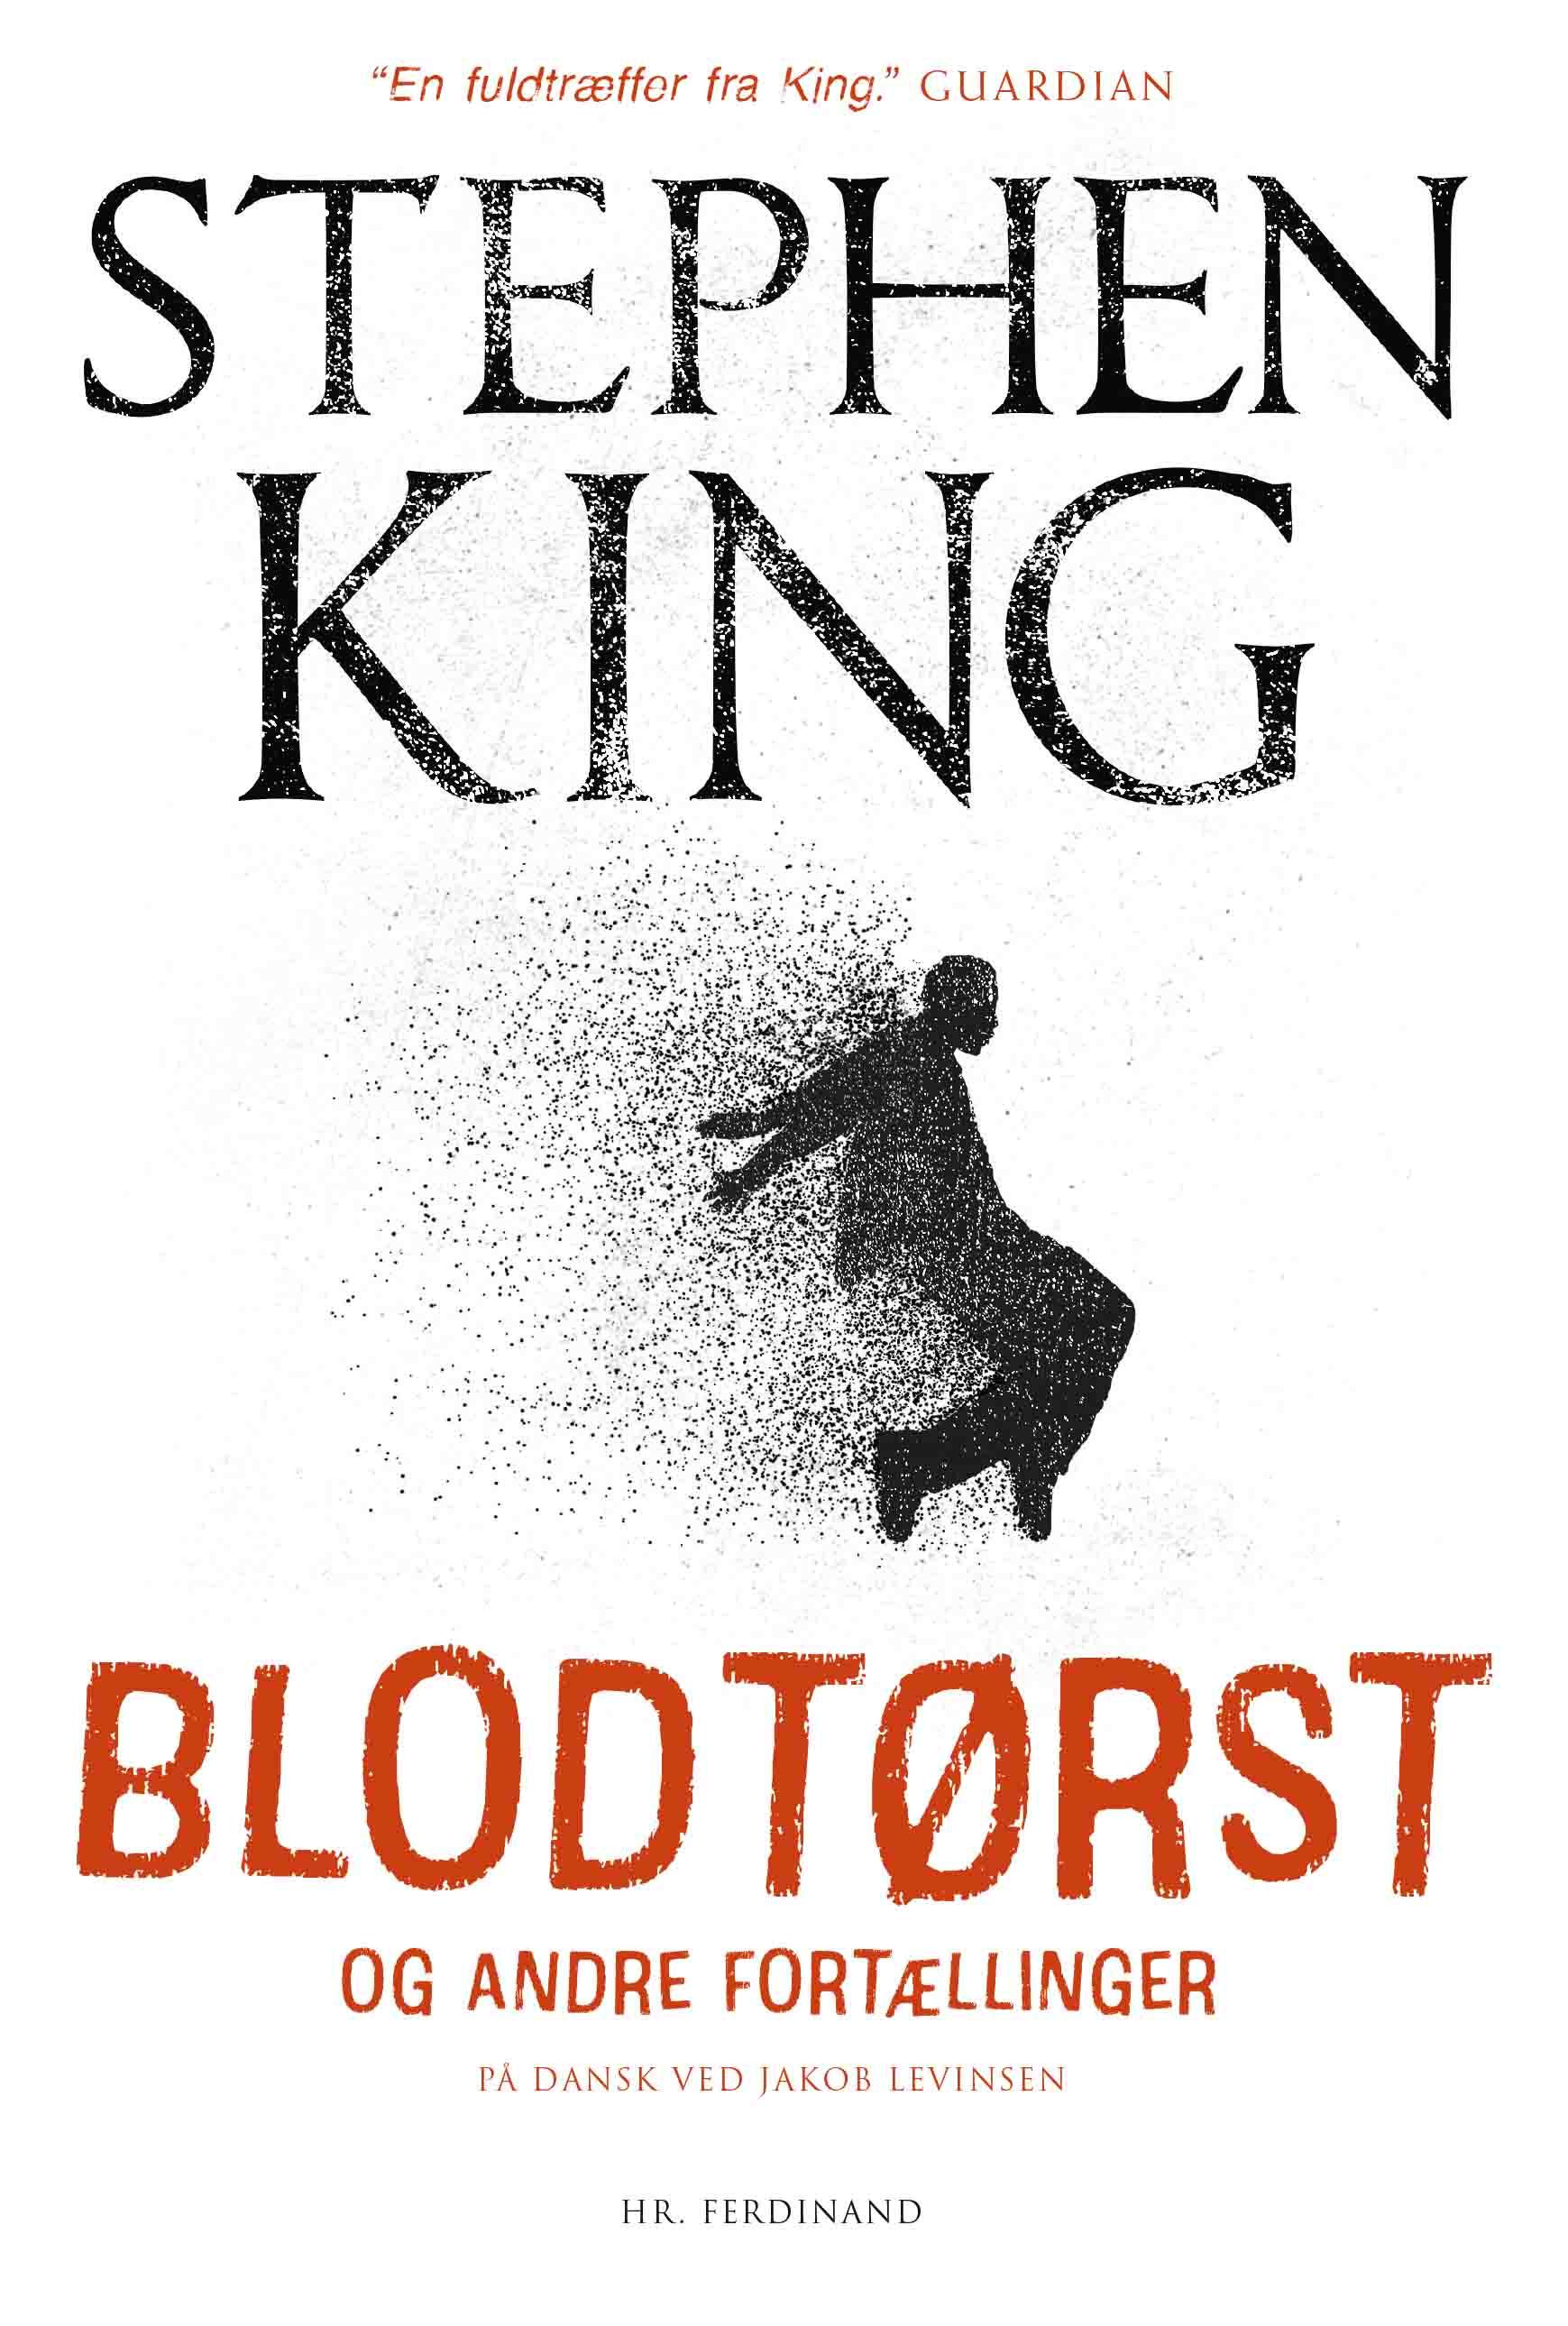 Blodtørst - Stephen King - Bøger - Hr. Ferdinand - 9788740065213 - September 15, 2021